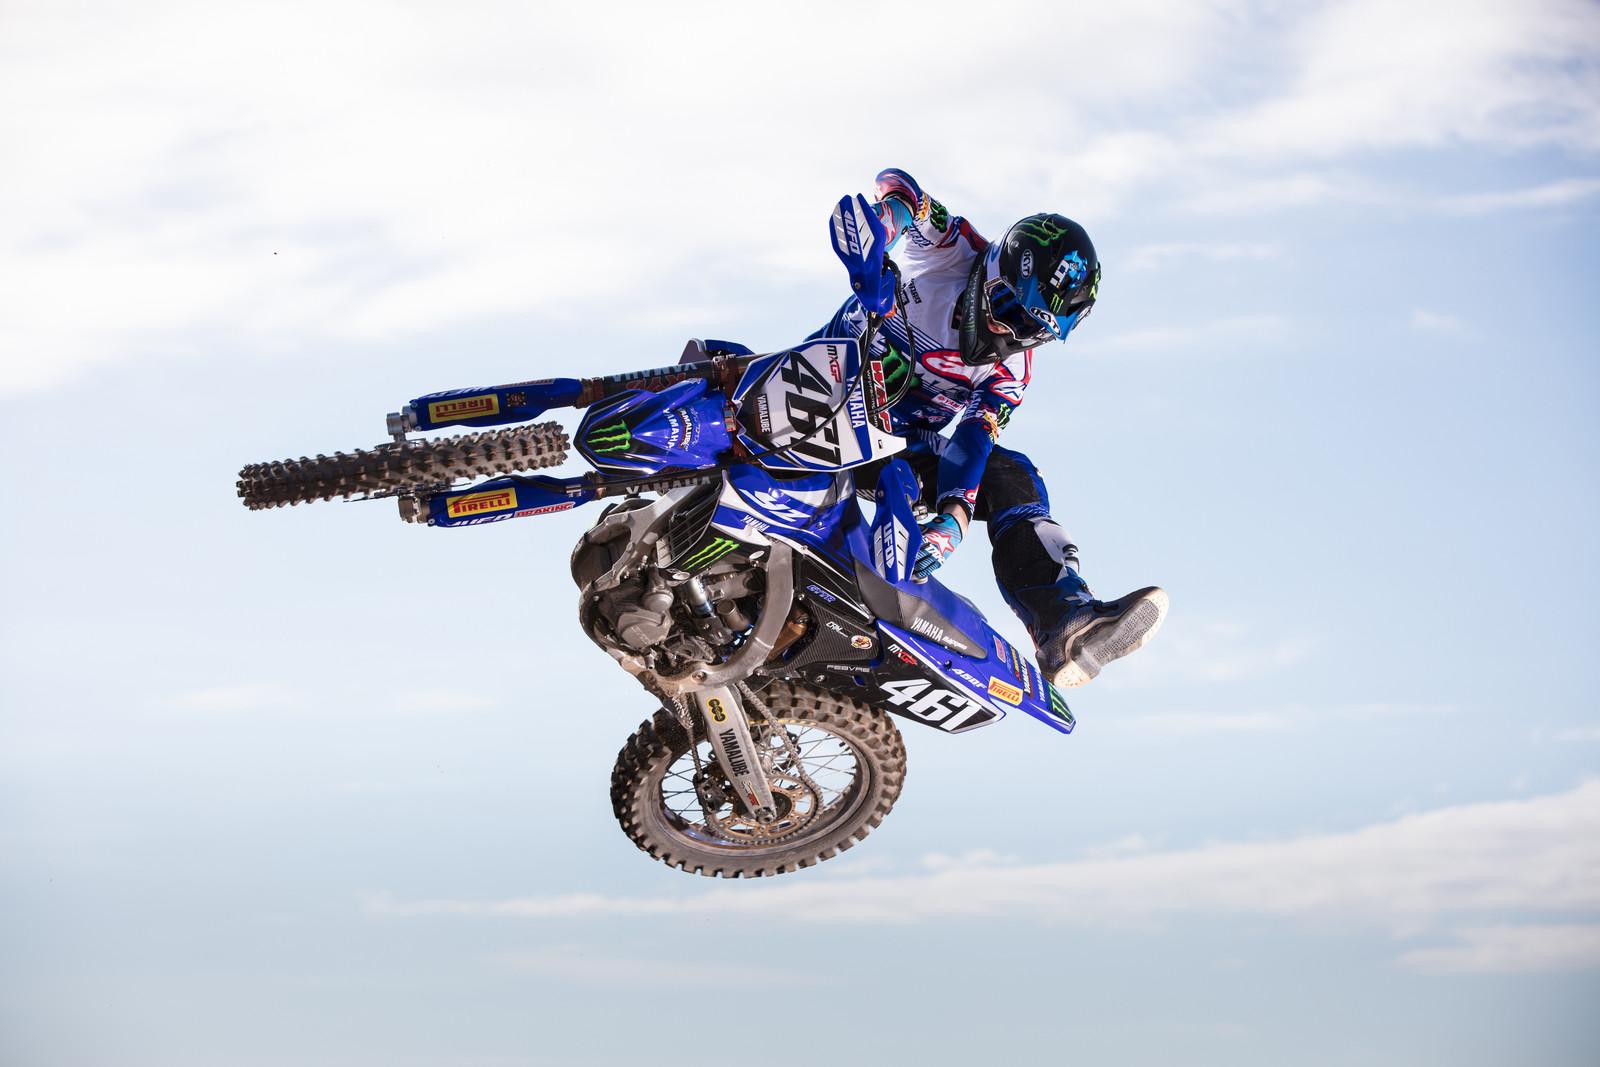 Romain Febvre - First Look: 2017 Monster Energy & Wilvo Yamaha MXGP Teams - Motocross Pictures - Vital MX